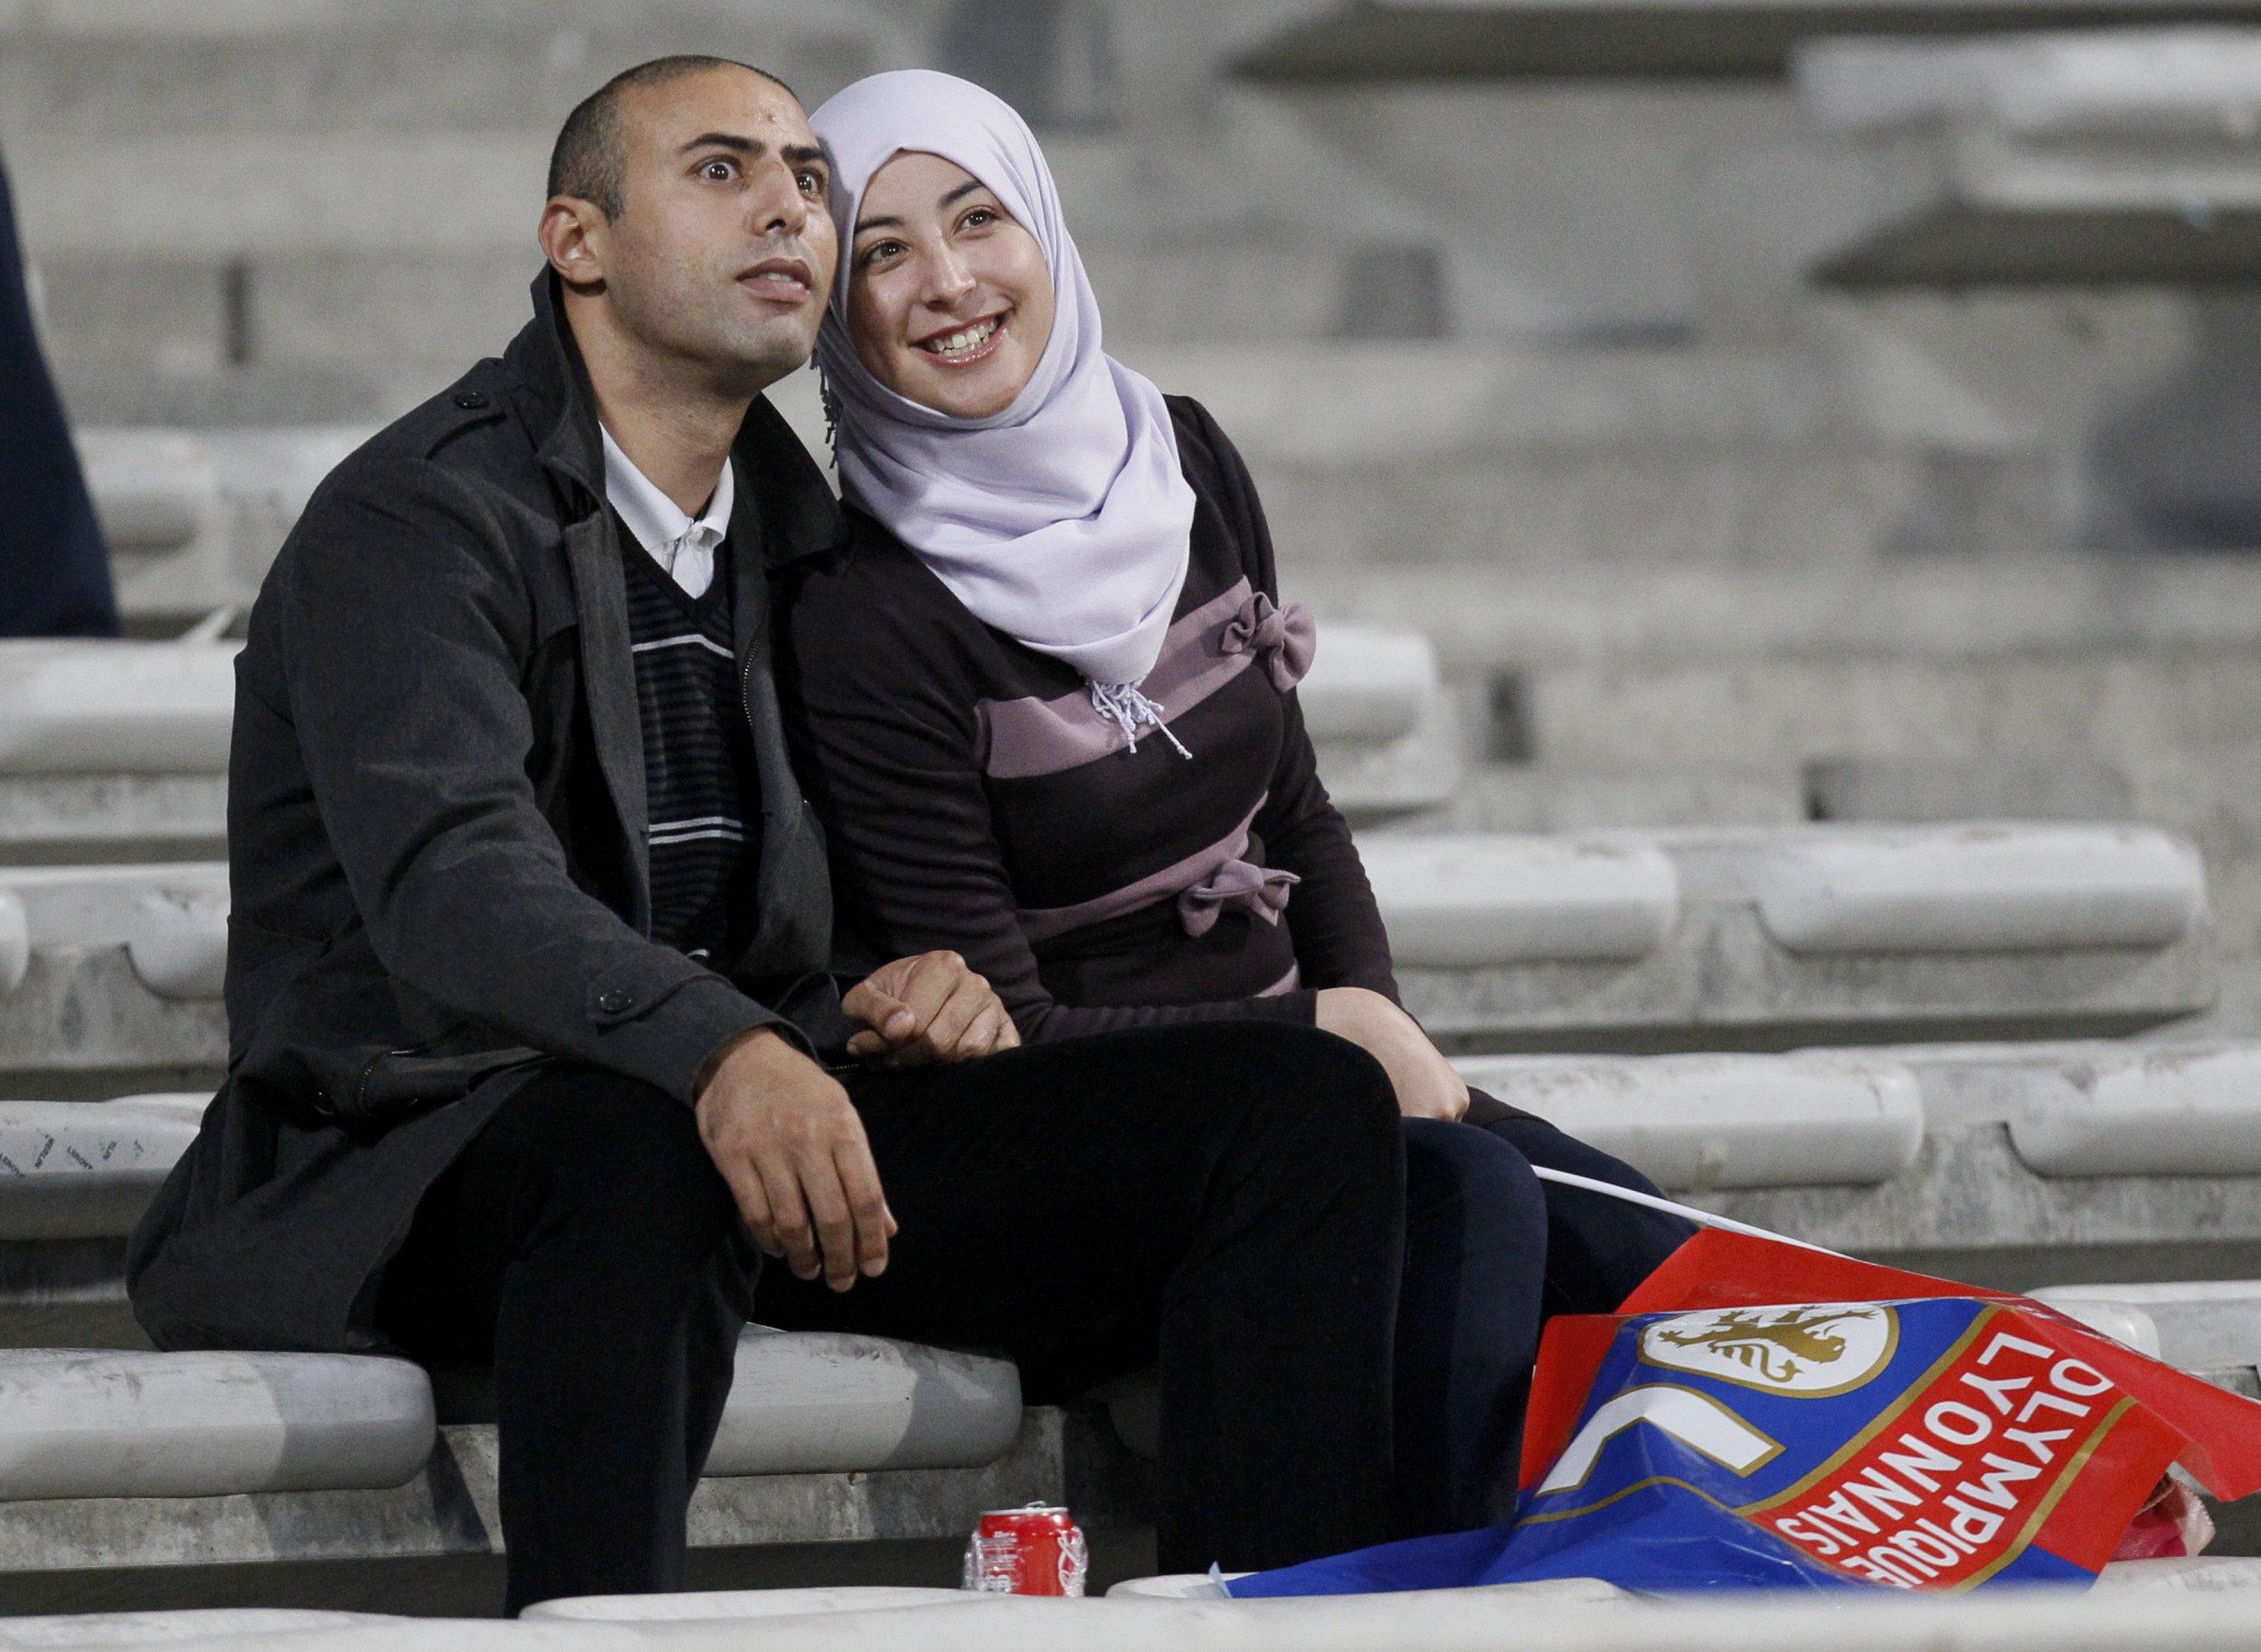 Football fans attend Lyon match, France